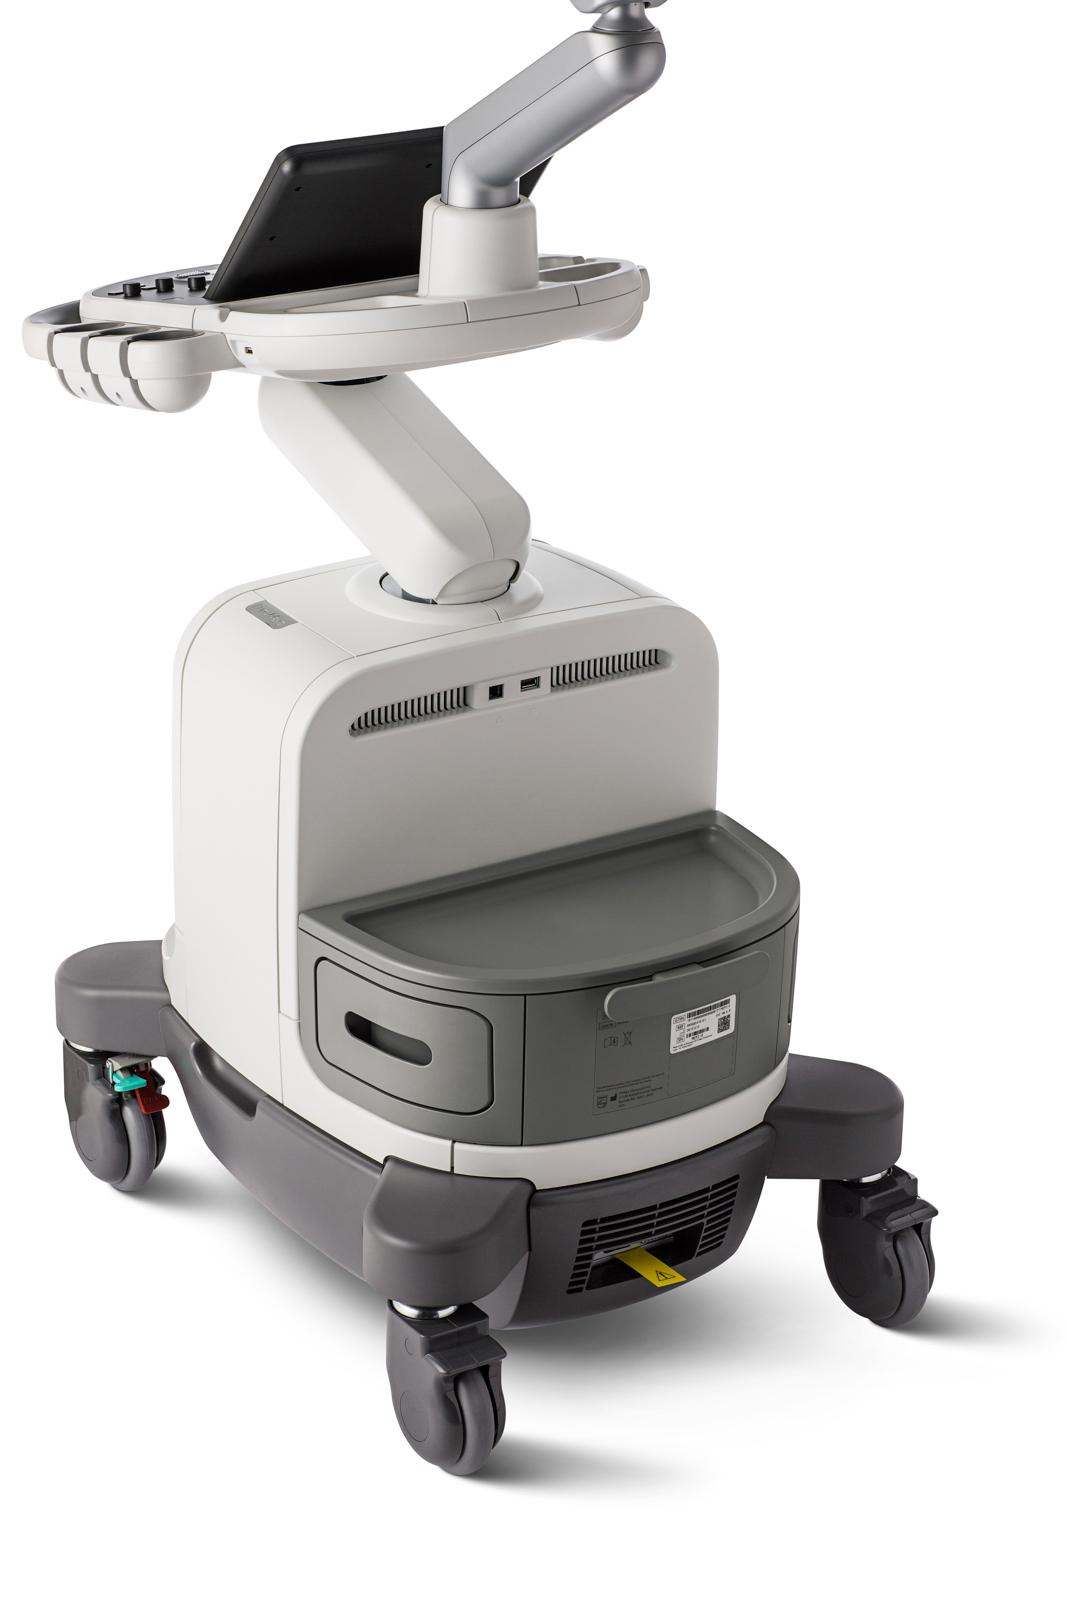 УЗД апарат – Philips Affiniti 50 - RH